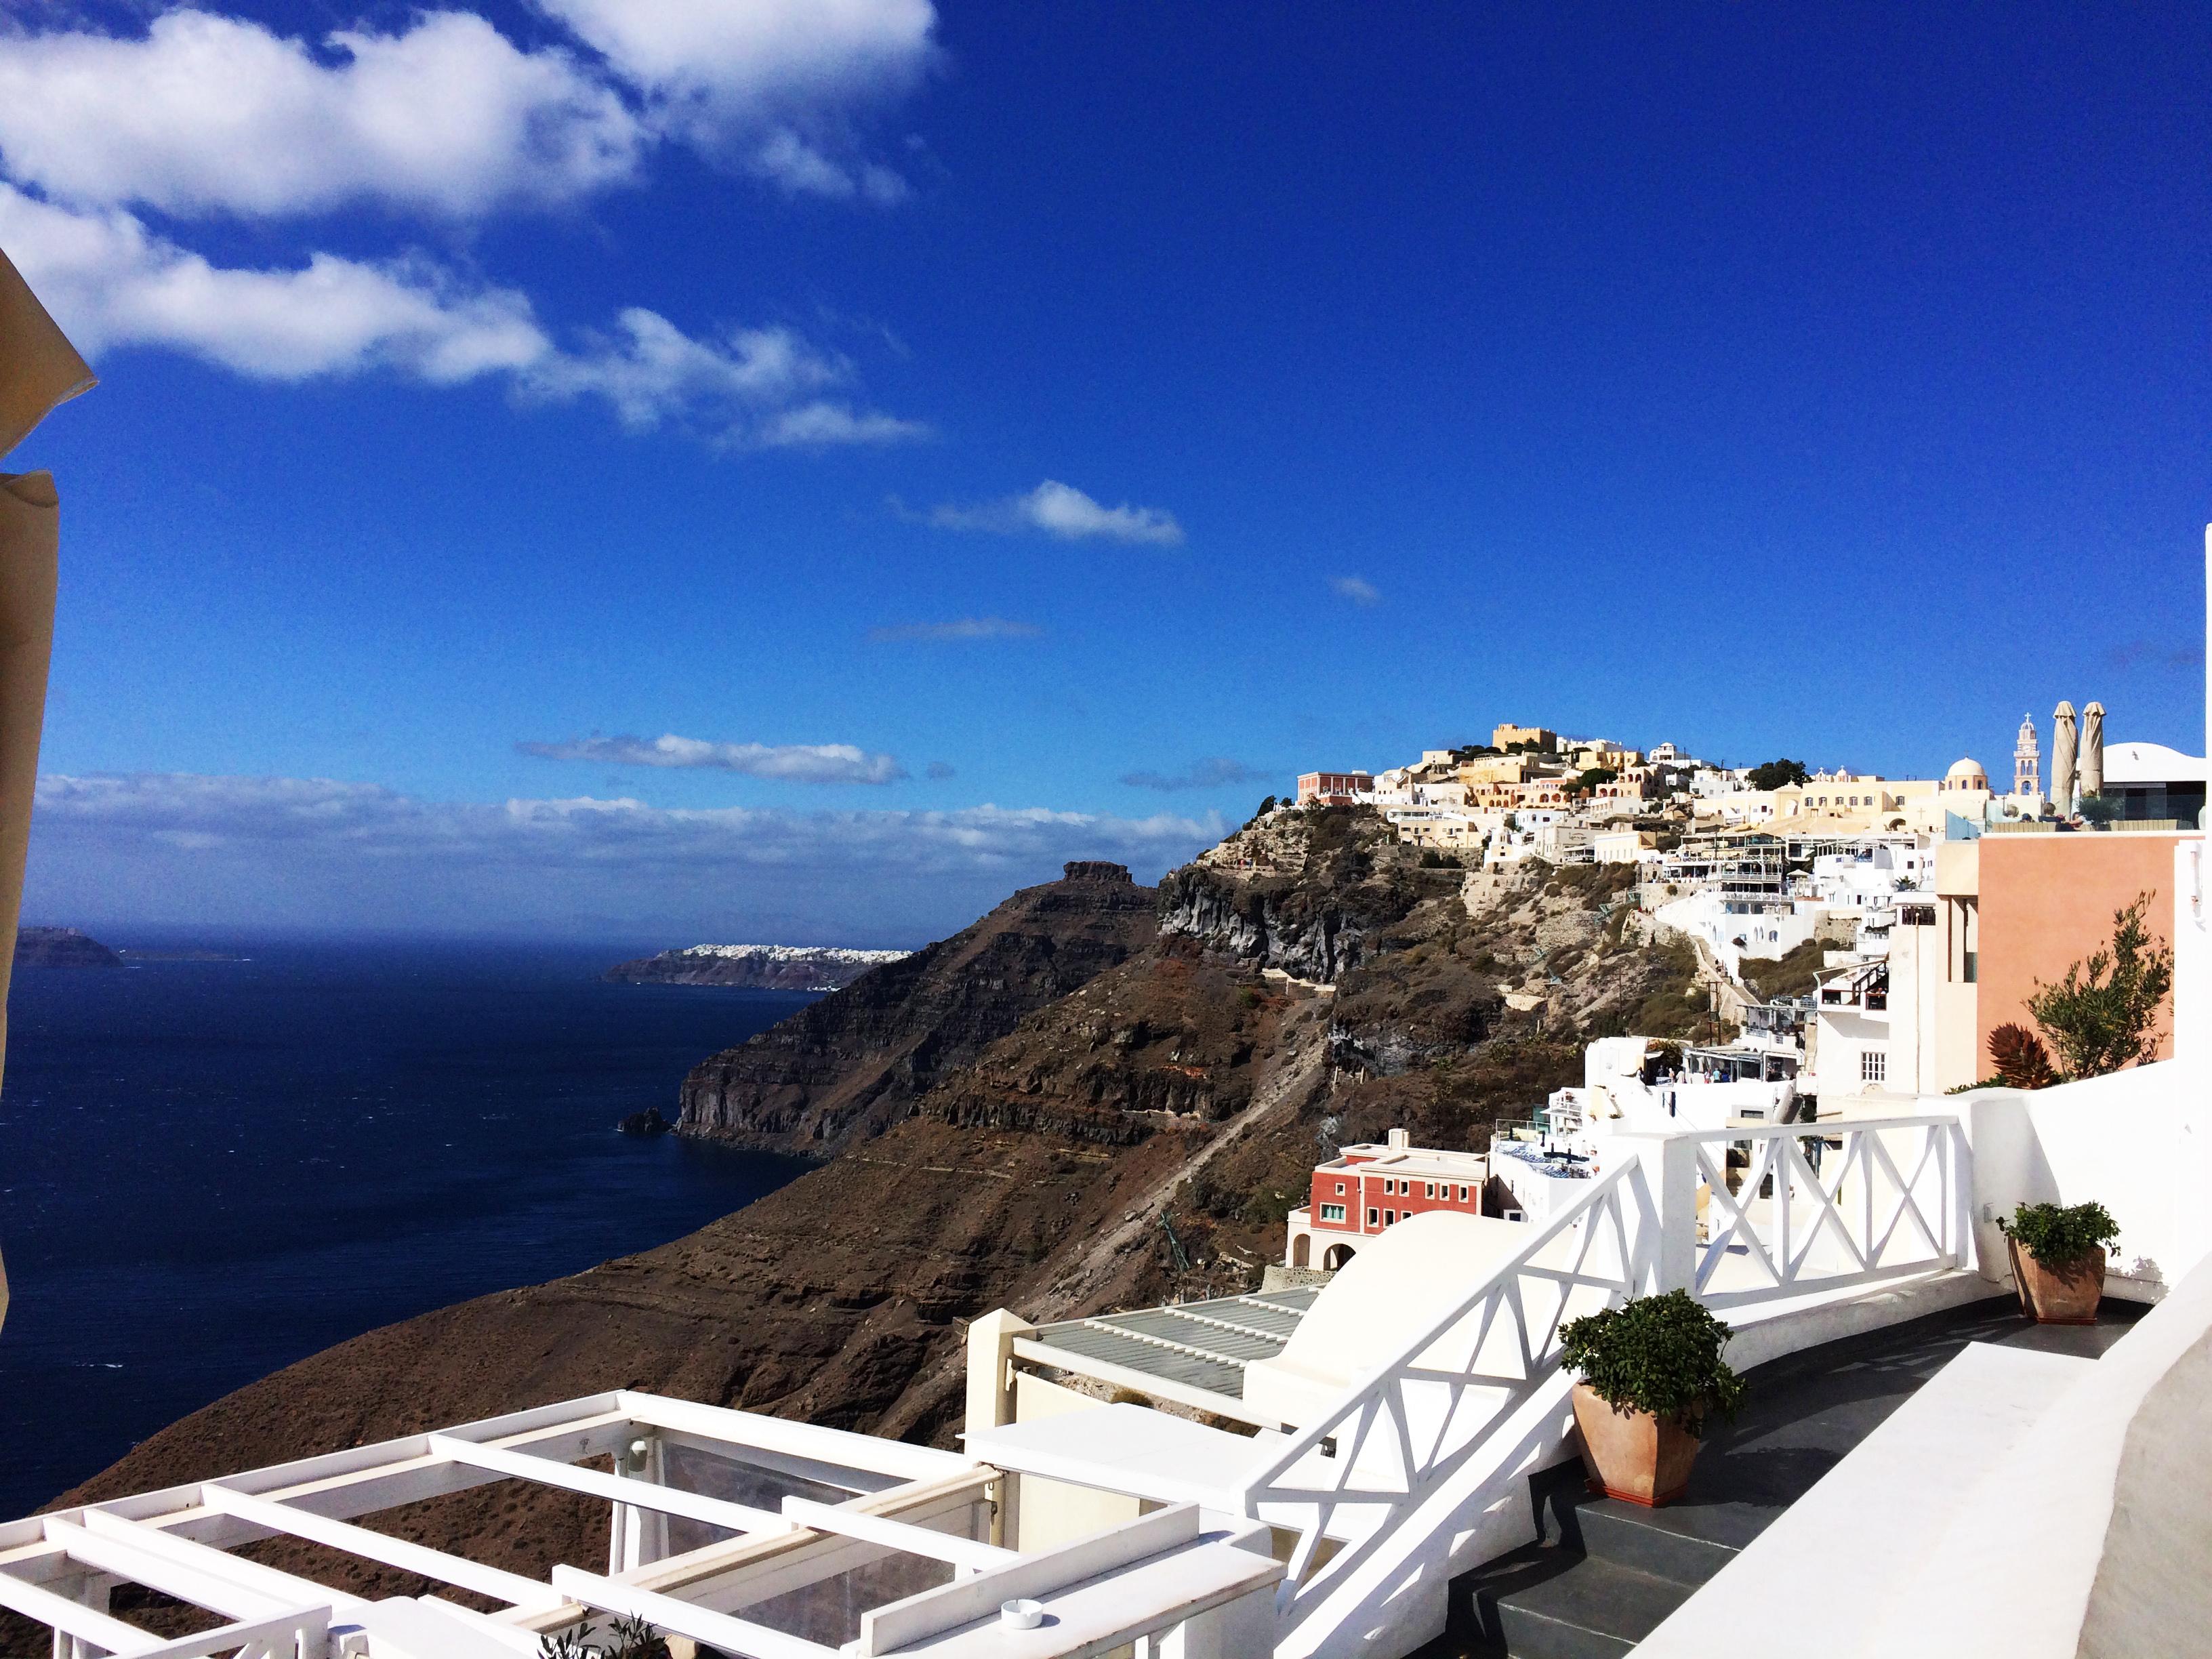 Santorin Grèce mer bleue